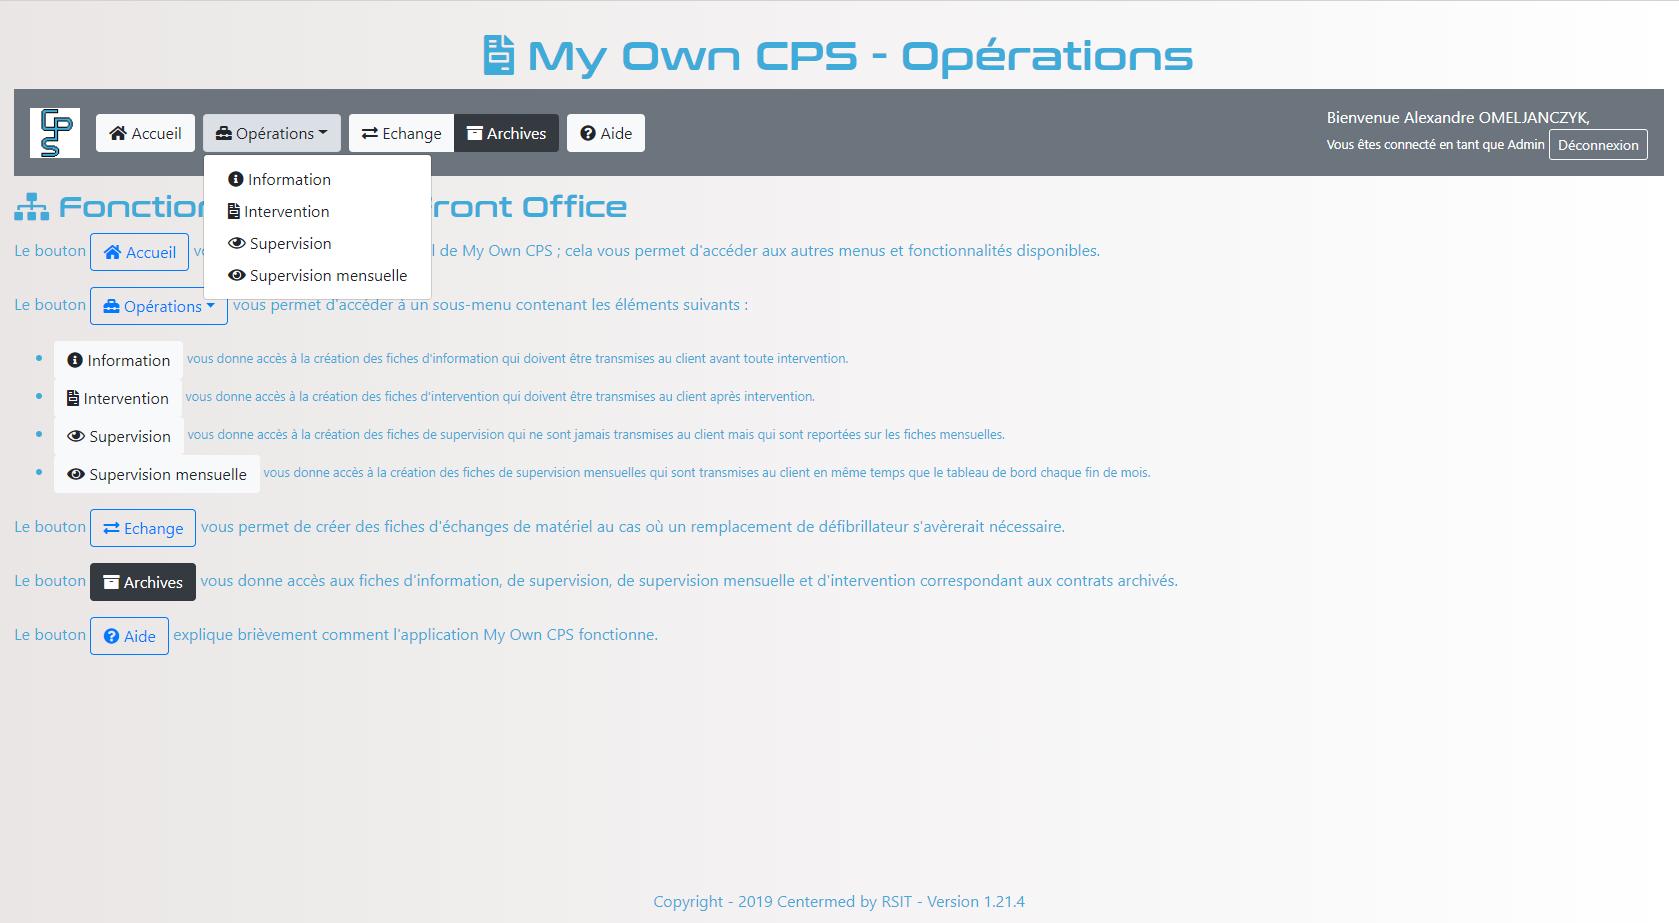 MyOwnCPS